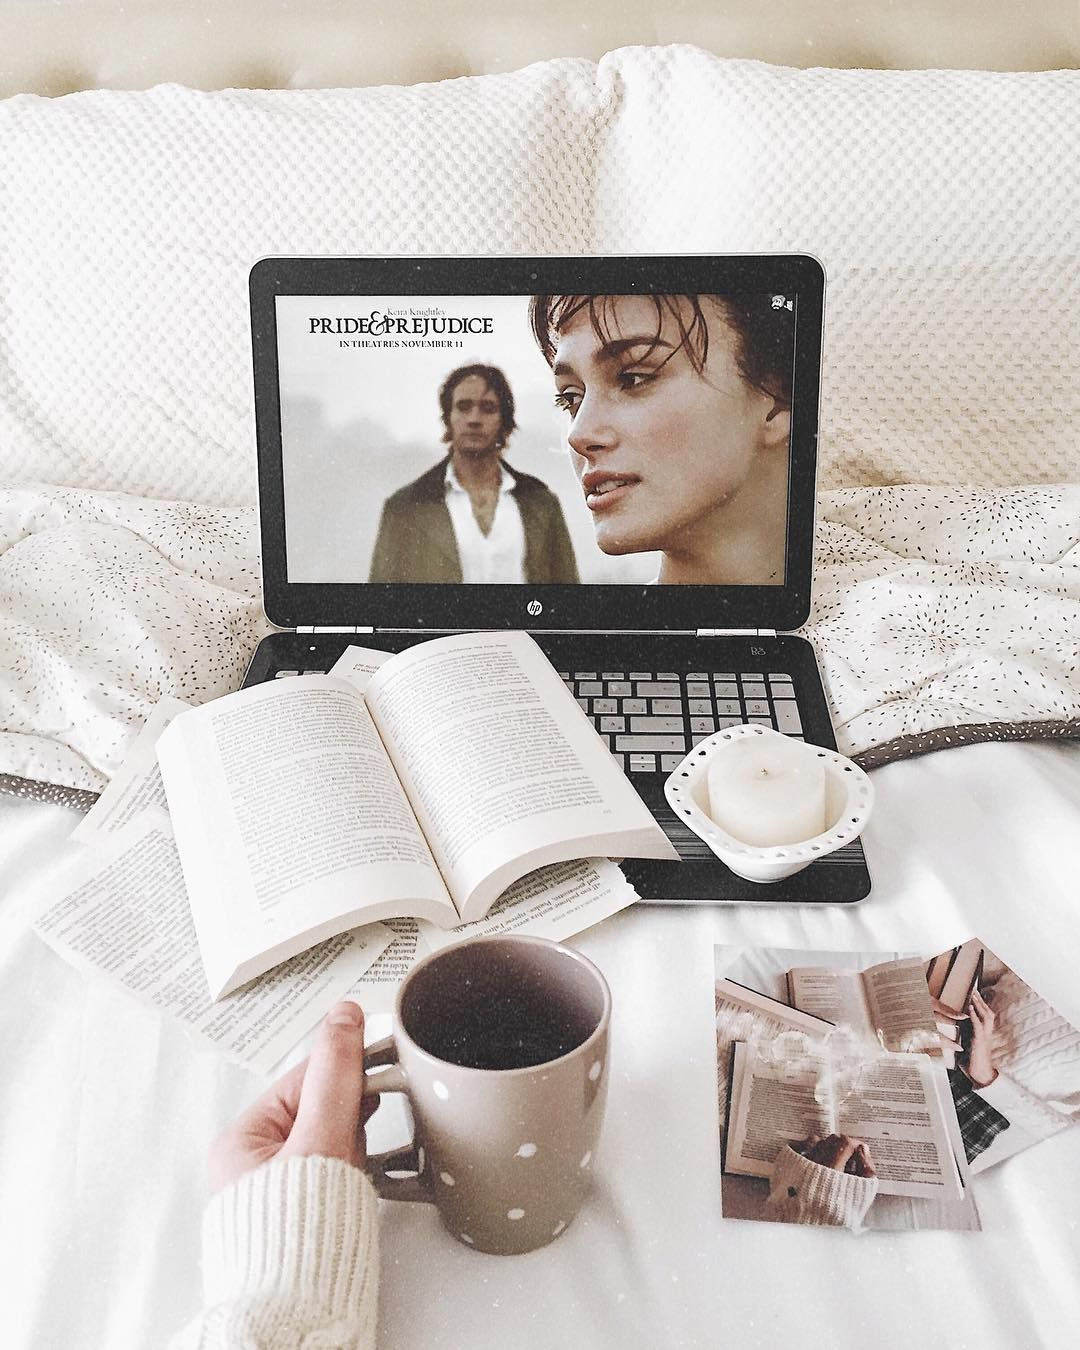 Instagram On Instagram My Favorite Classic And Film Pride And Prejudice I Love Jane Auste In 2020 Pride And Prejudice Book Instagram Bookstagram Inspiration